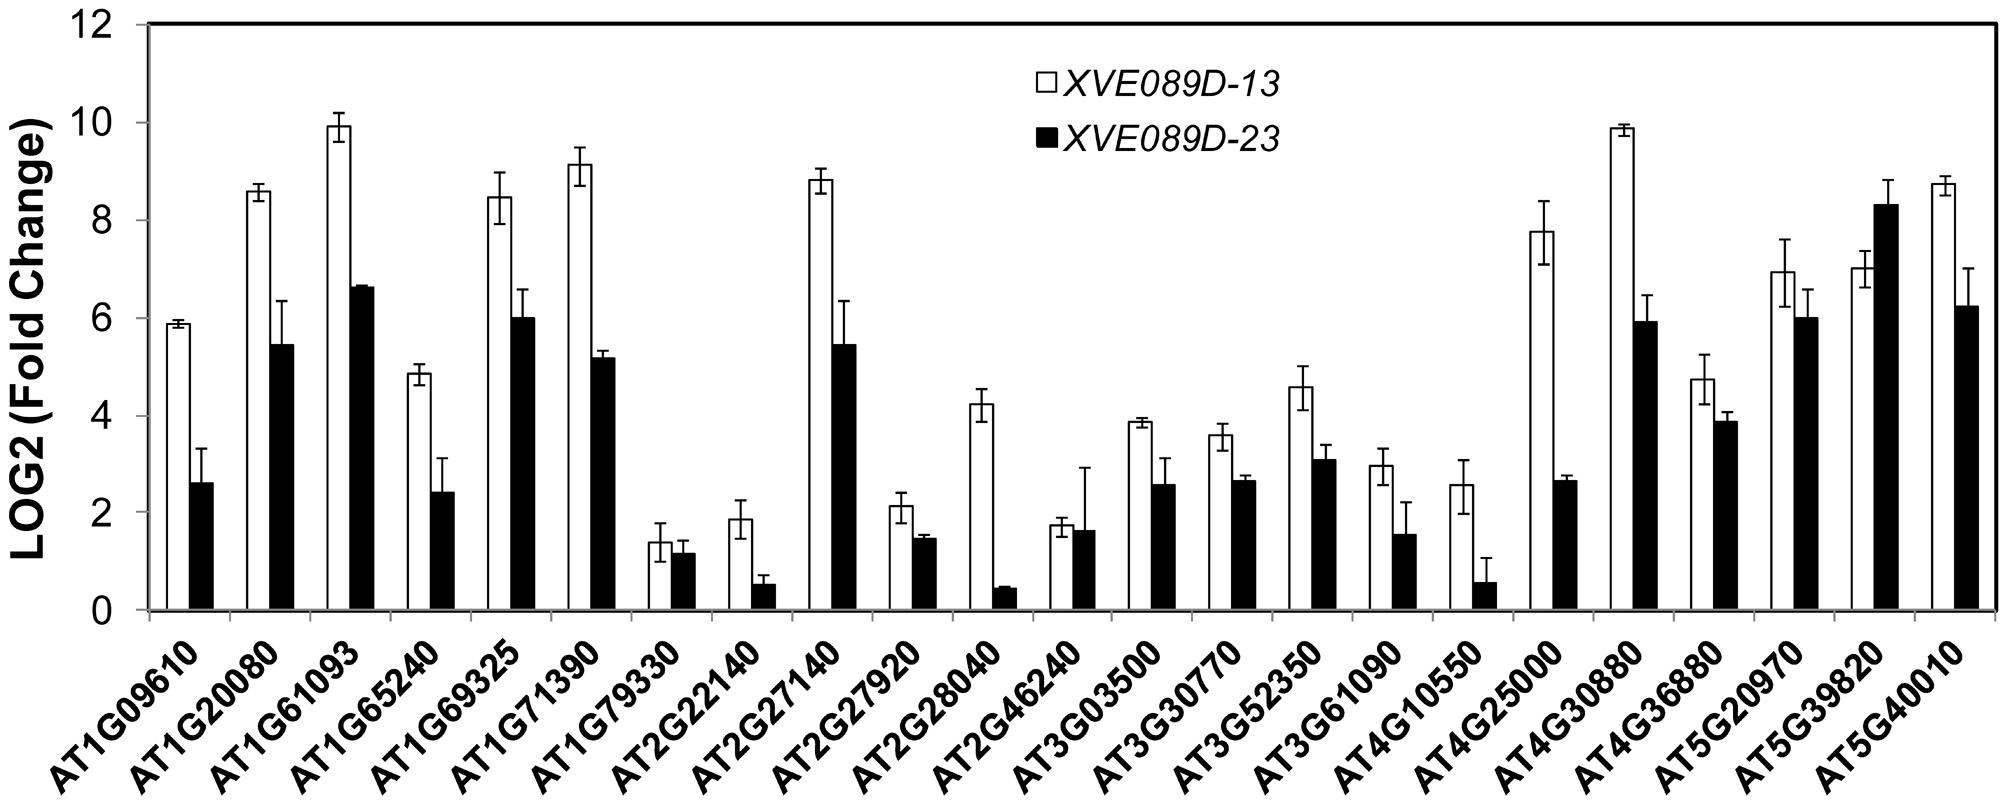 NAC089 regulates many downstream genes.